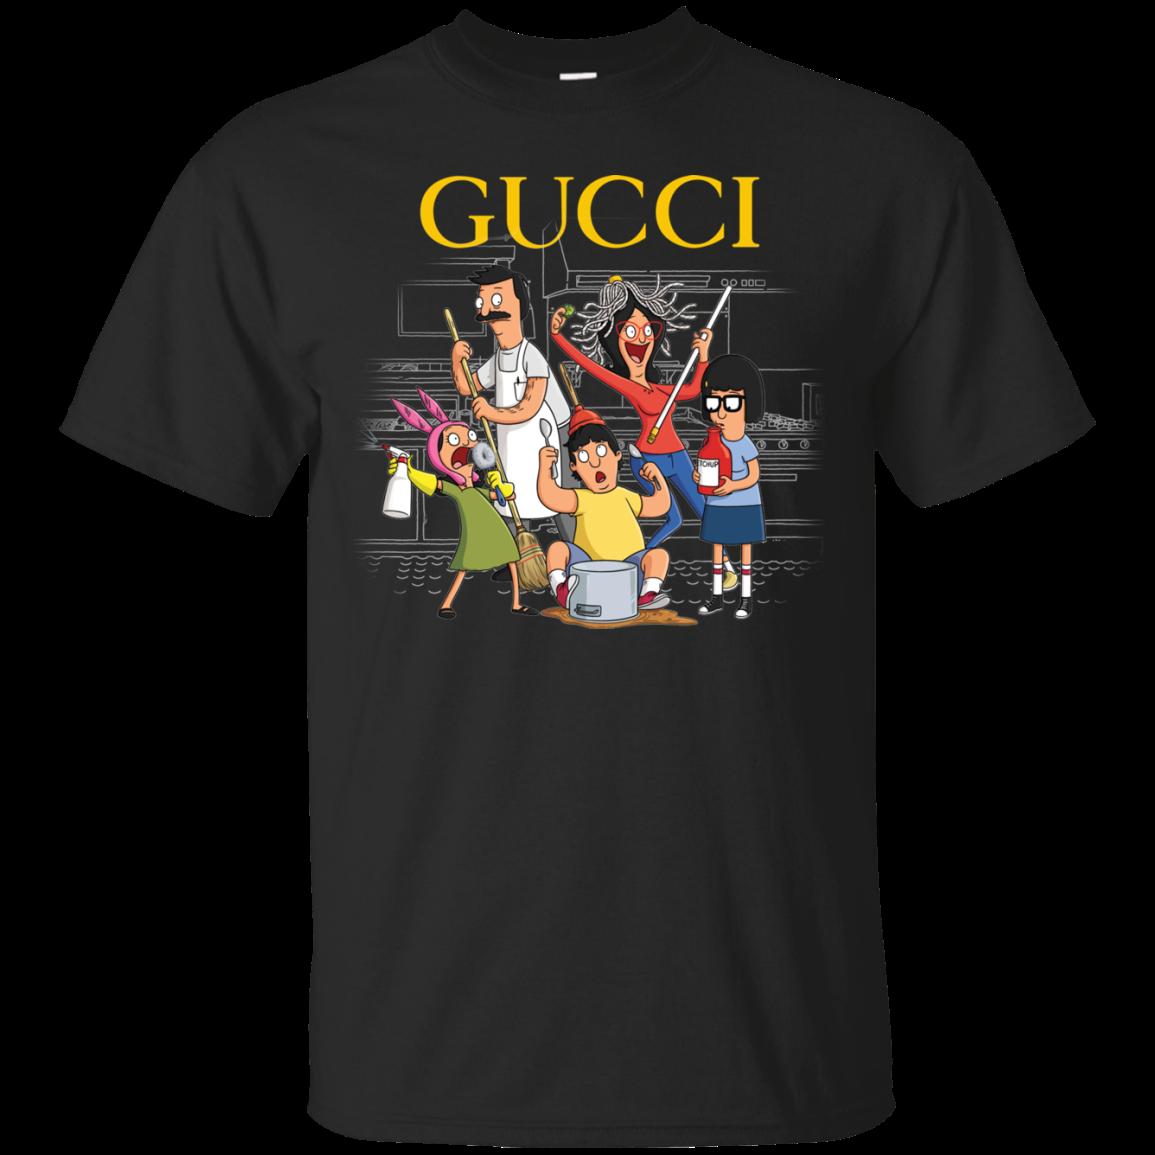 26e8bf7c Gucci - Bob's Burgers unisex t shirt, tank, long sleeve, hoodie ...